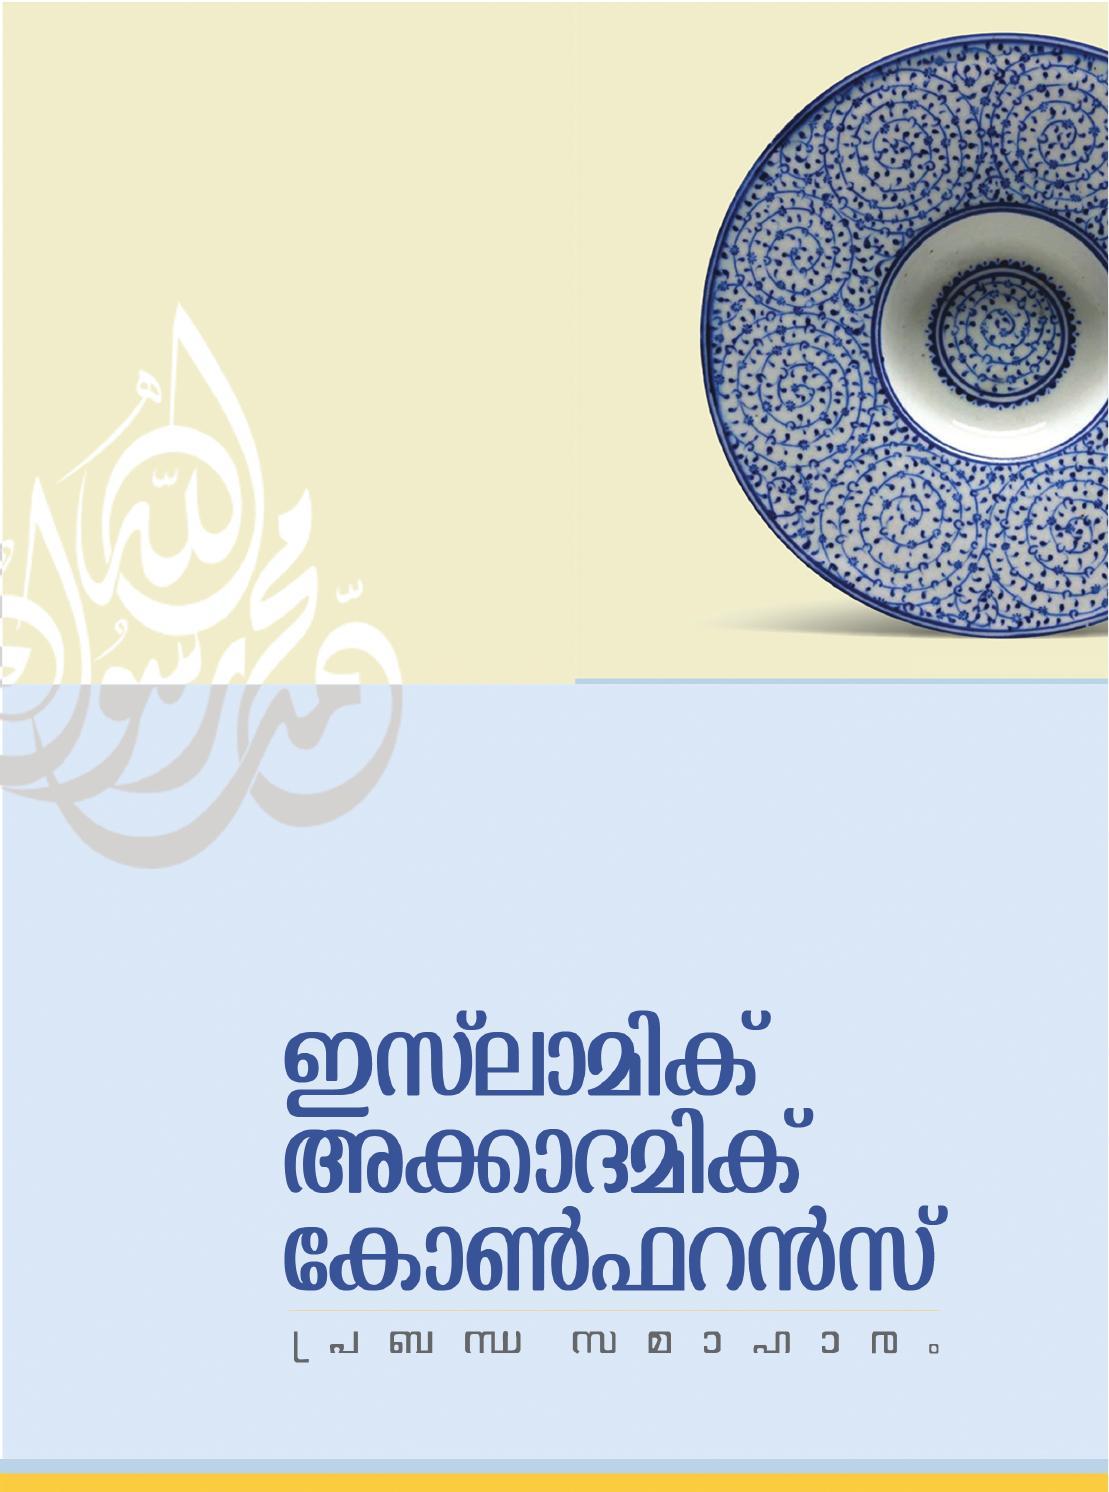 Islamic Academic Conference Proceedings By Ubaid Rehman Issuu Cmp Hwi Origina